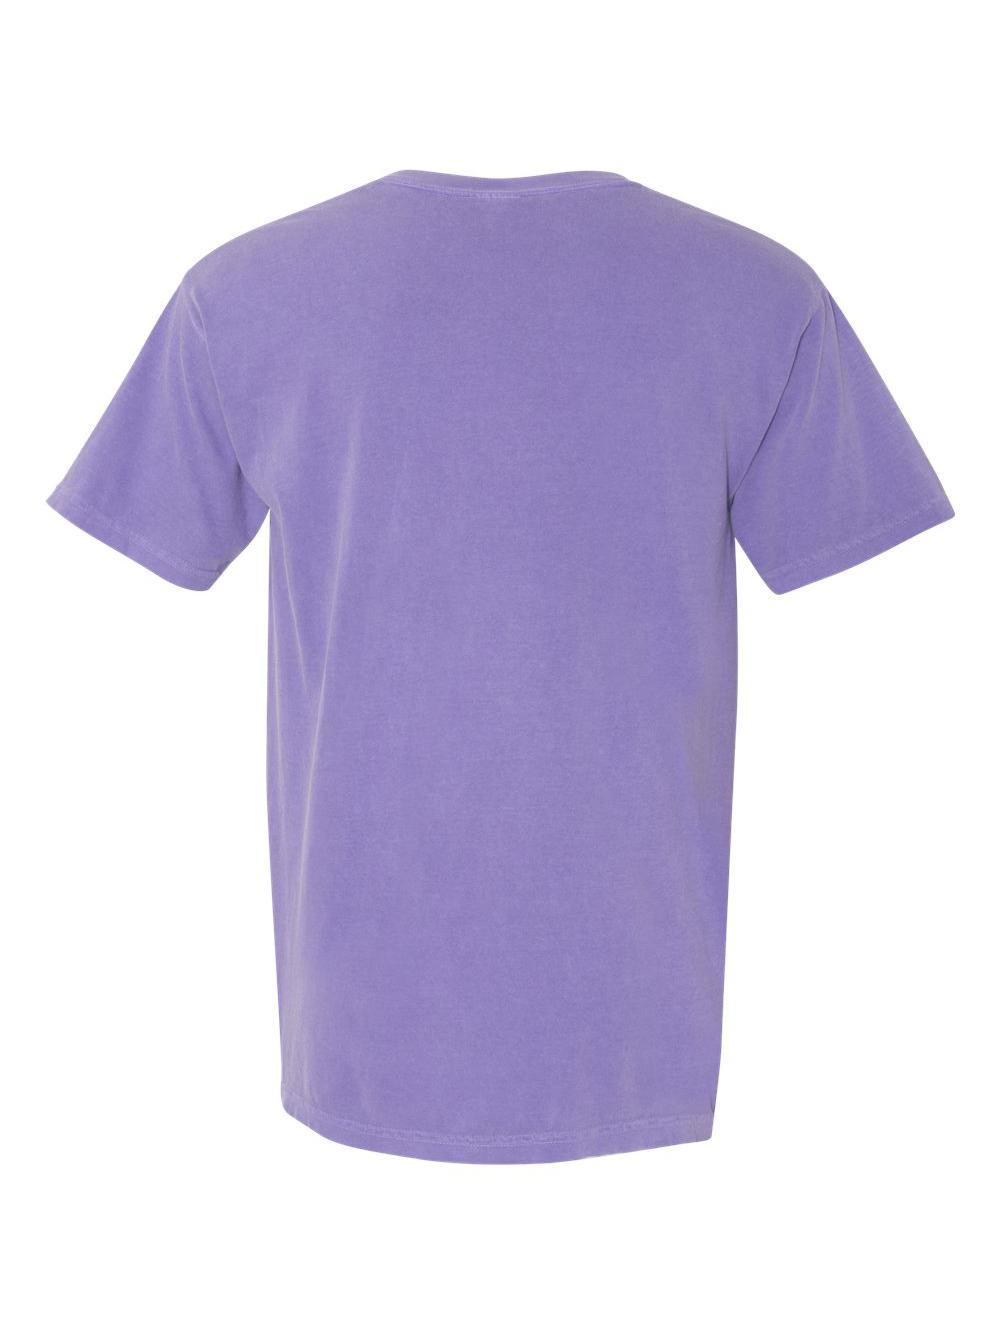 Comfort-Colors-Garment-Dyed-Heavyweight-Ringspun-Short-Sleeve-Shirt-1717 thumbnail 124